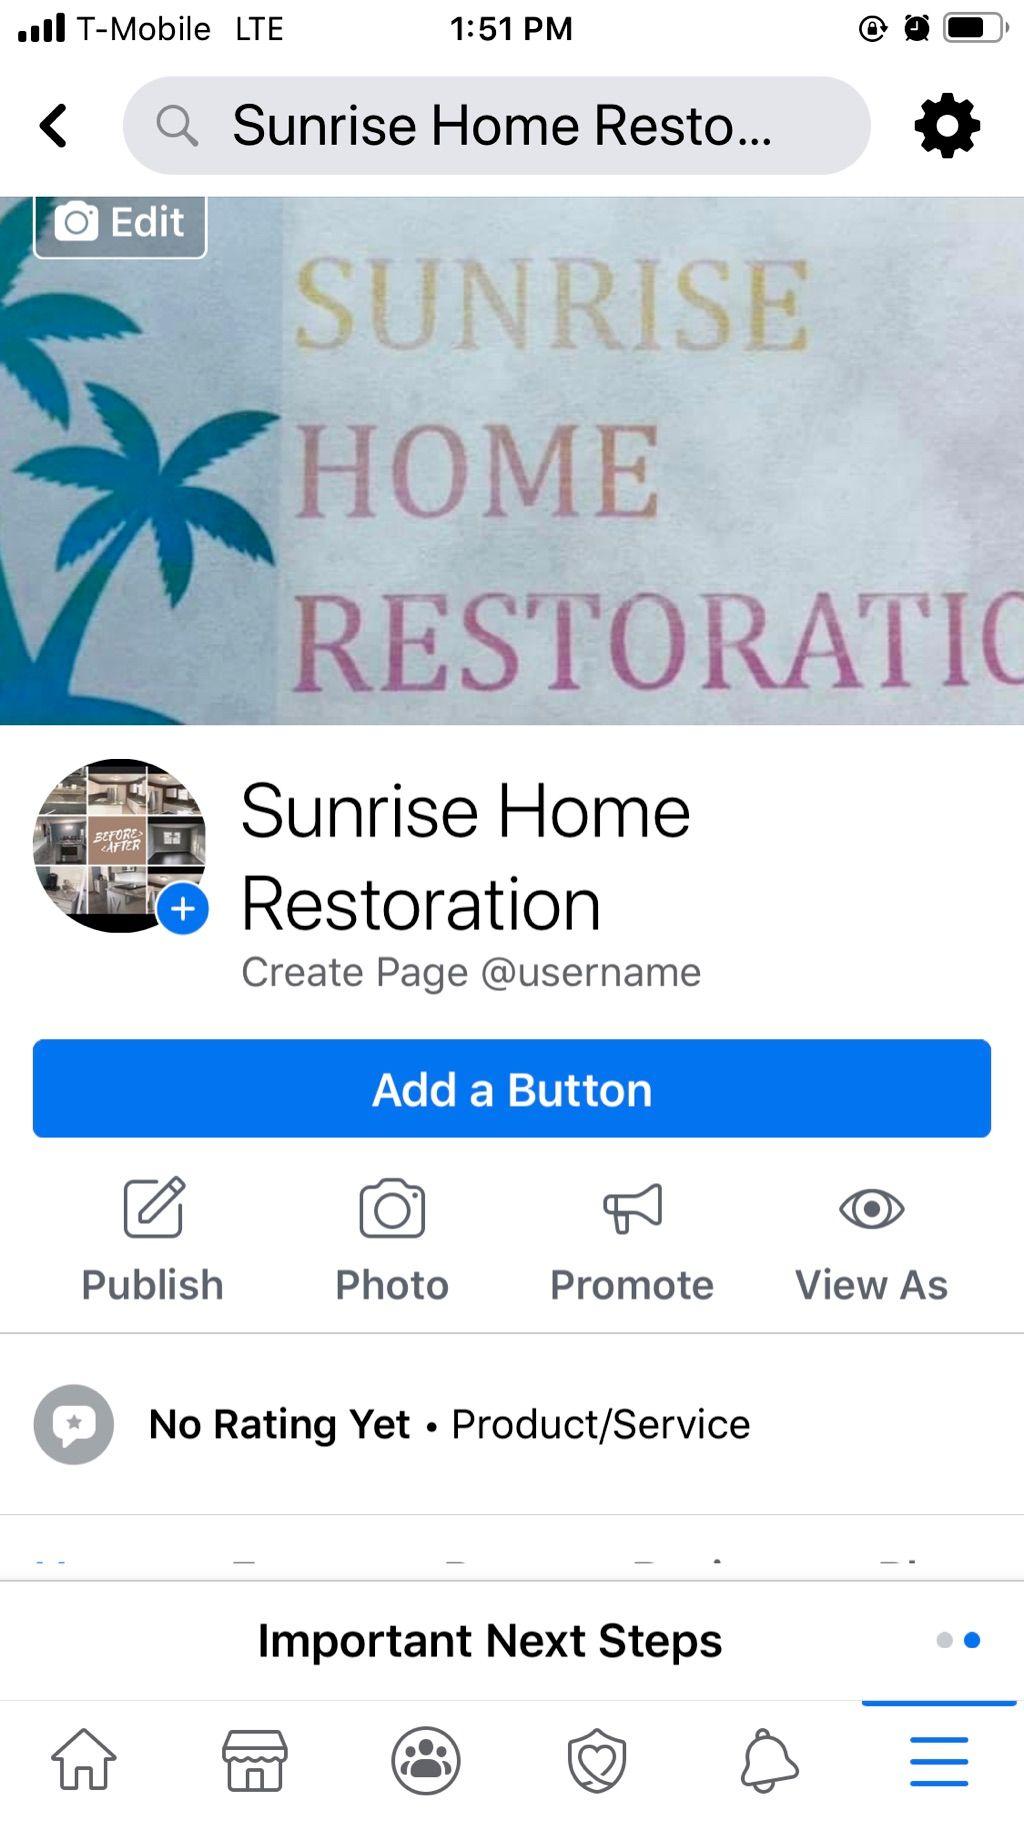 Sunrise Home Restoration